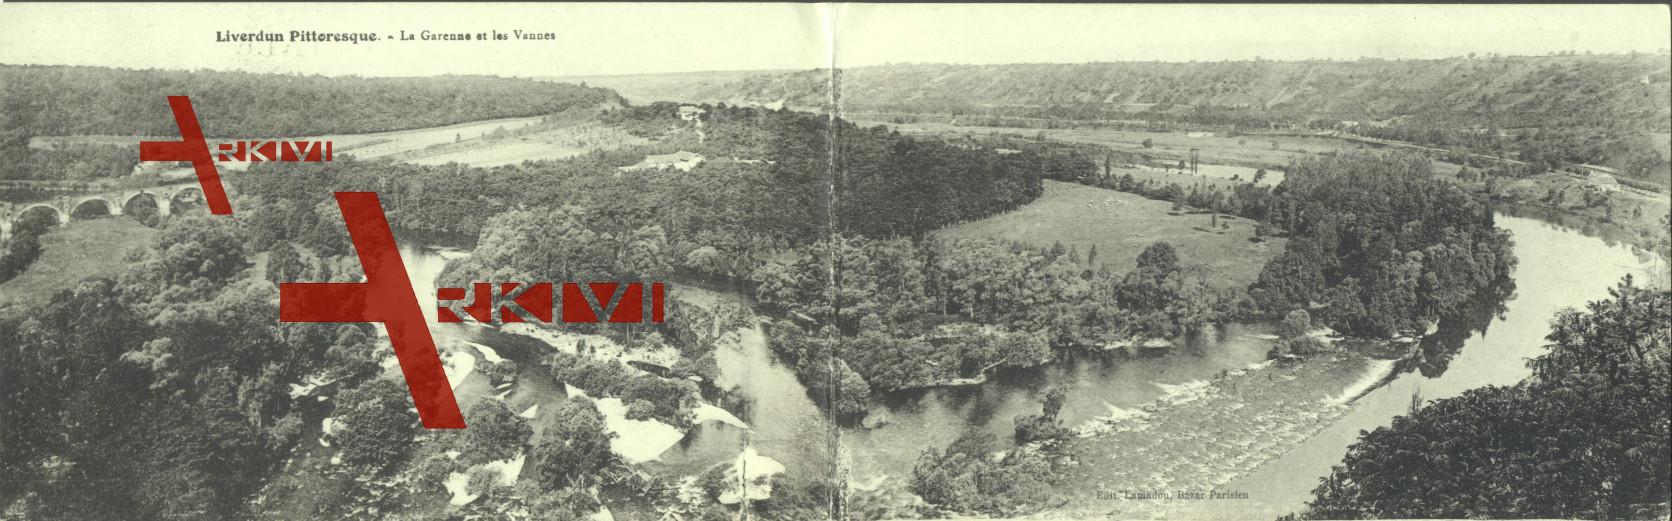 Klapp Liverdun Meurthe et Moselle, Garenne, Vannes